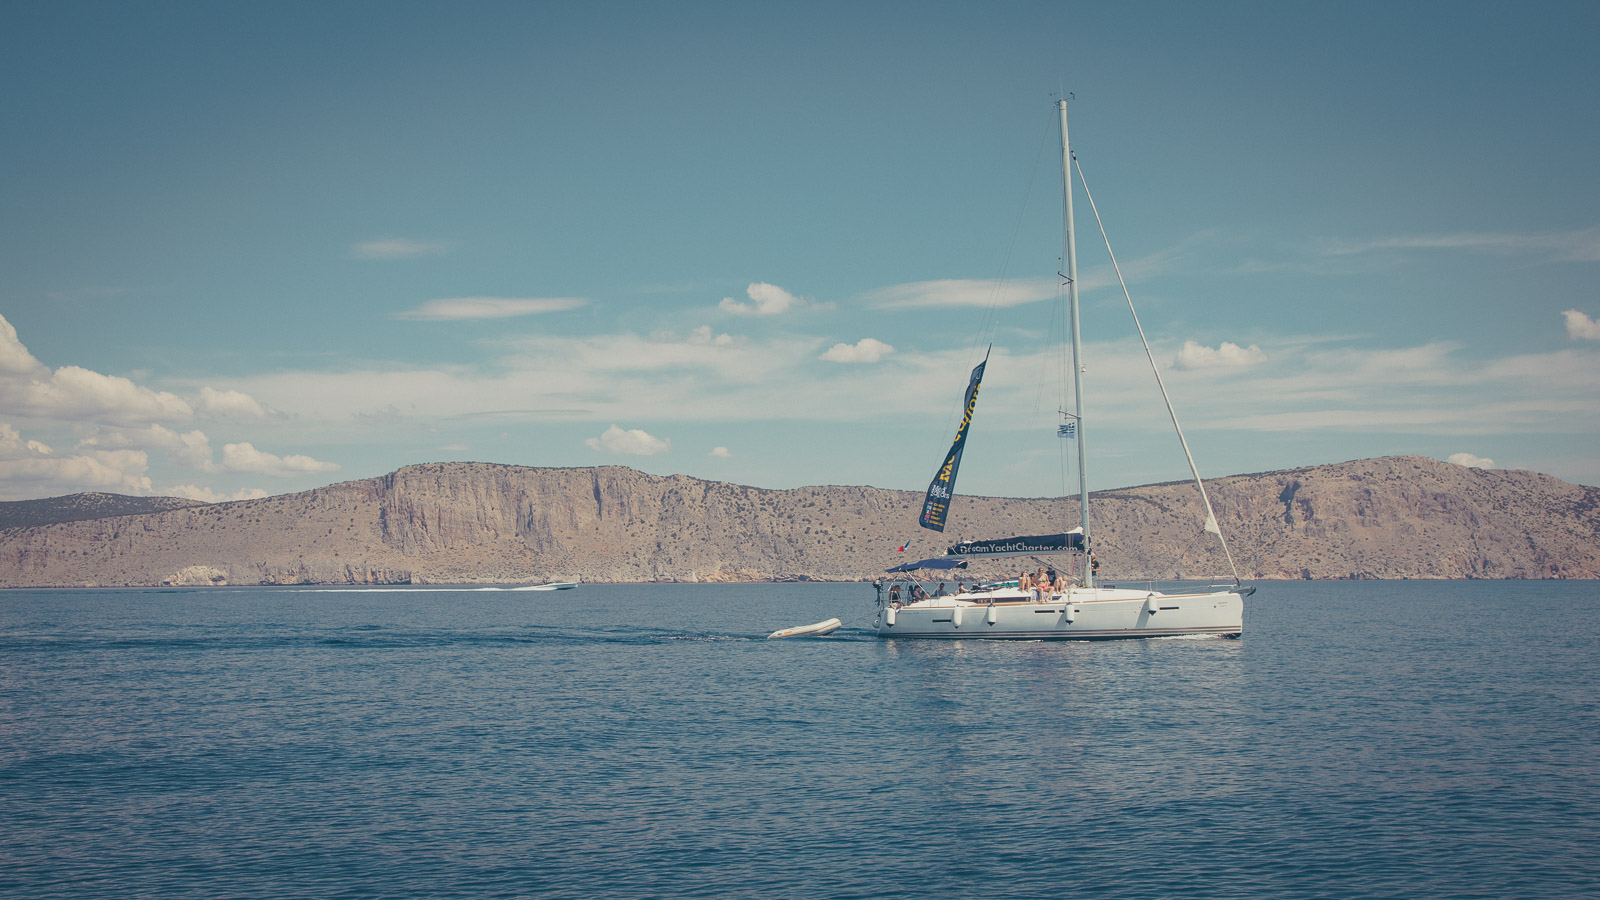 MedSailors's sailing boat